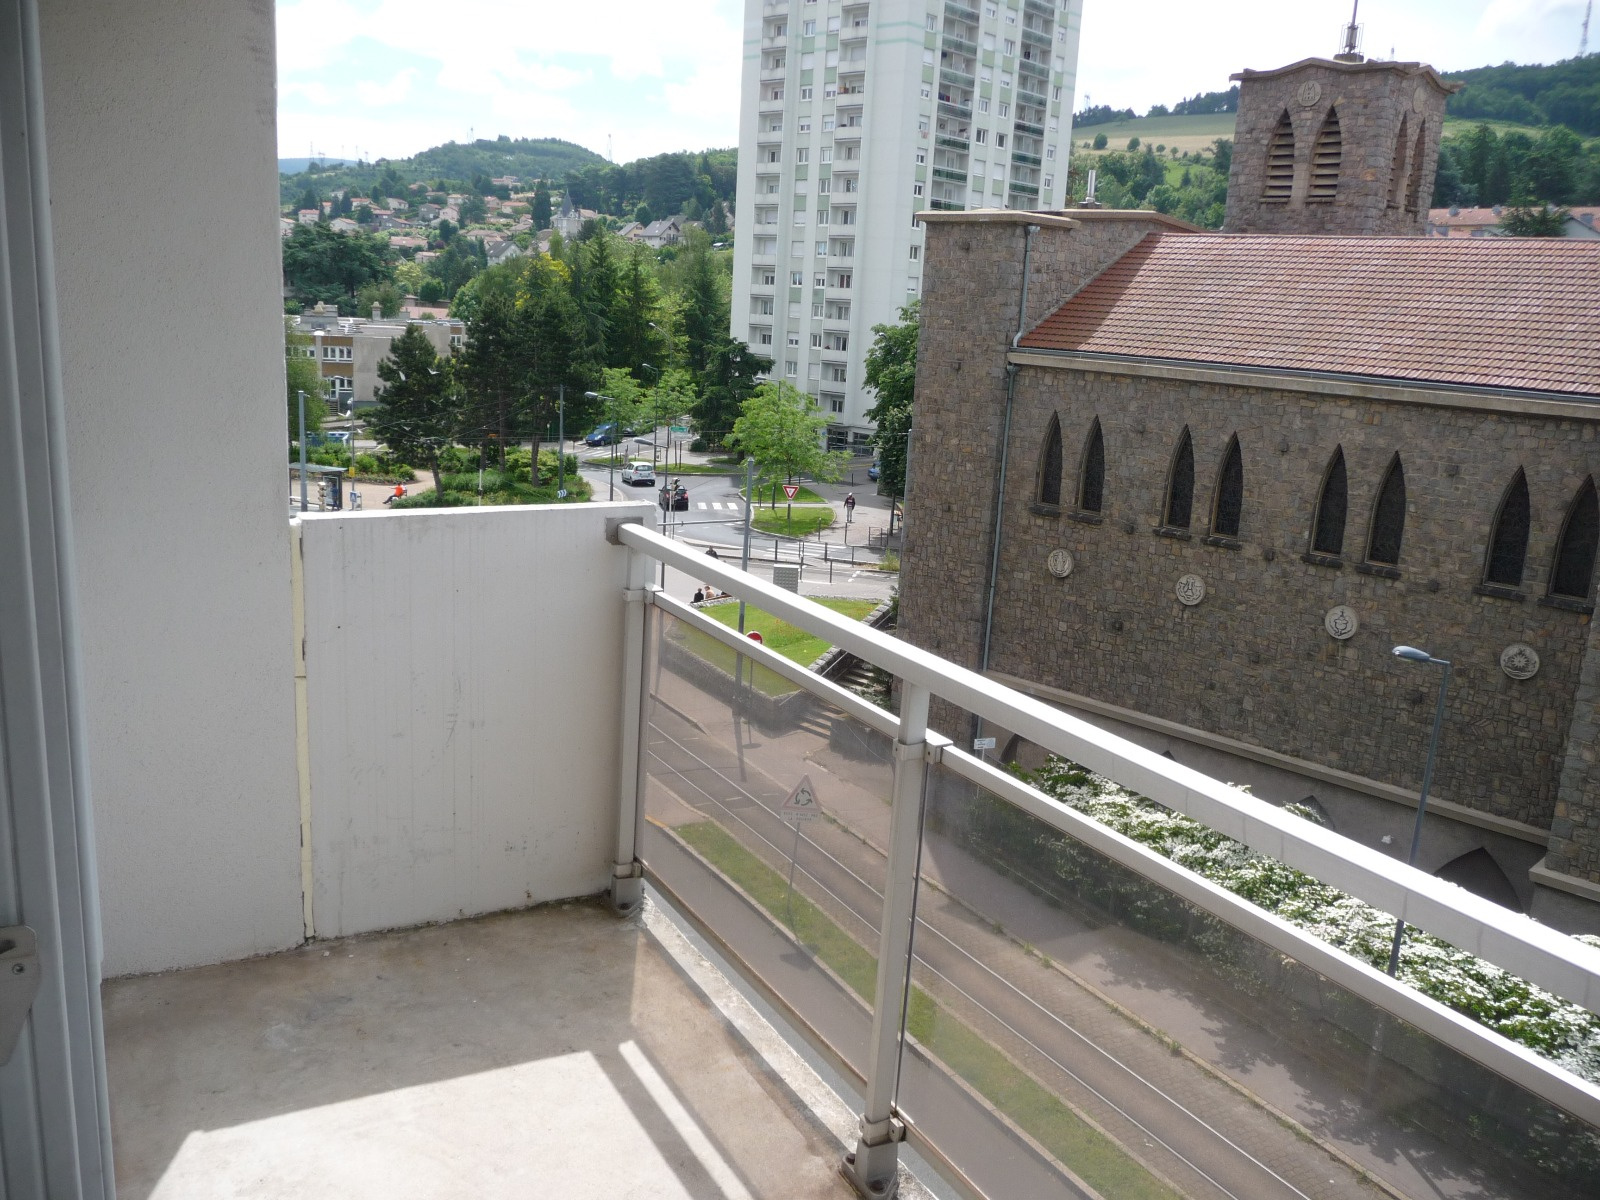 Vente f3 saint etienne for Garage tardy saint etienne